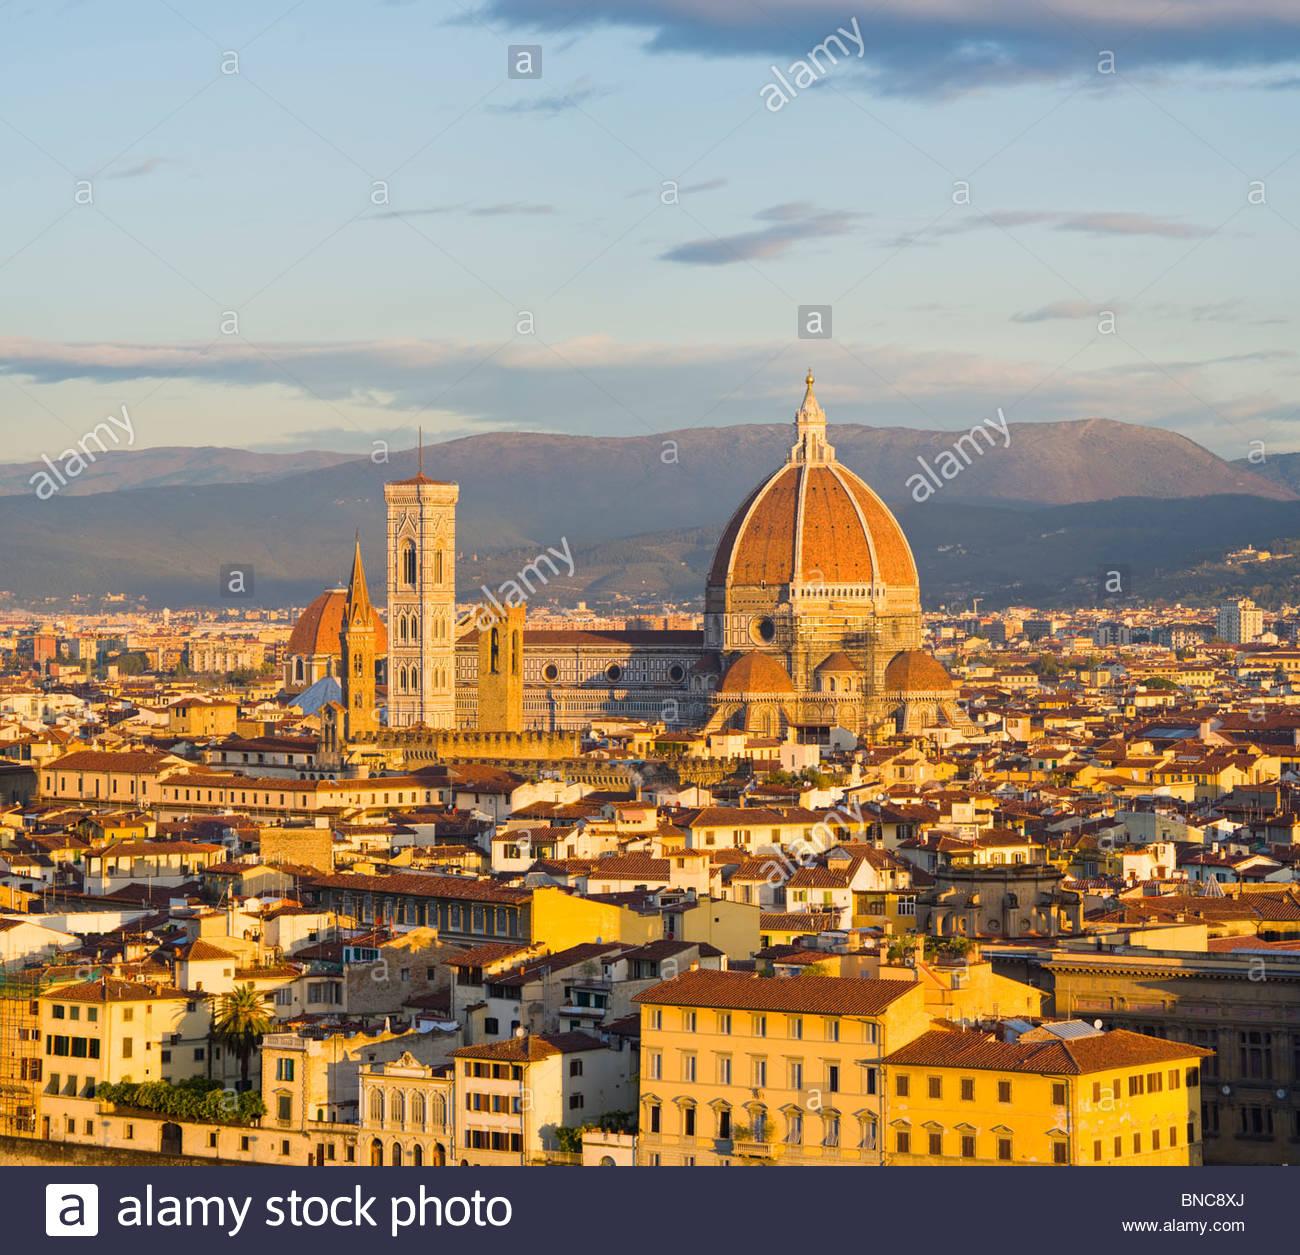 La Catedral (Basílica di Santa Maria del Fiore), Florencia, Toscana, Italia. Imagen De Stock